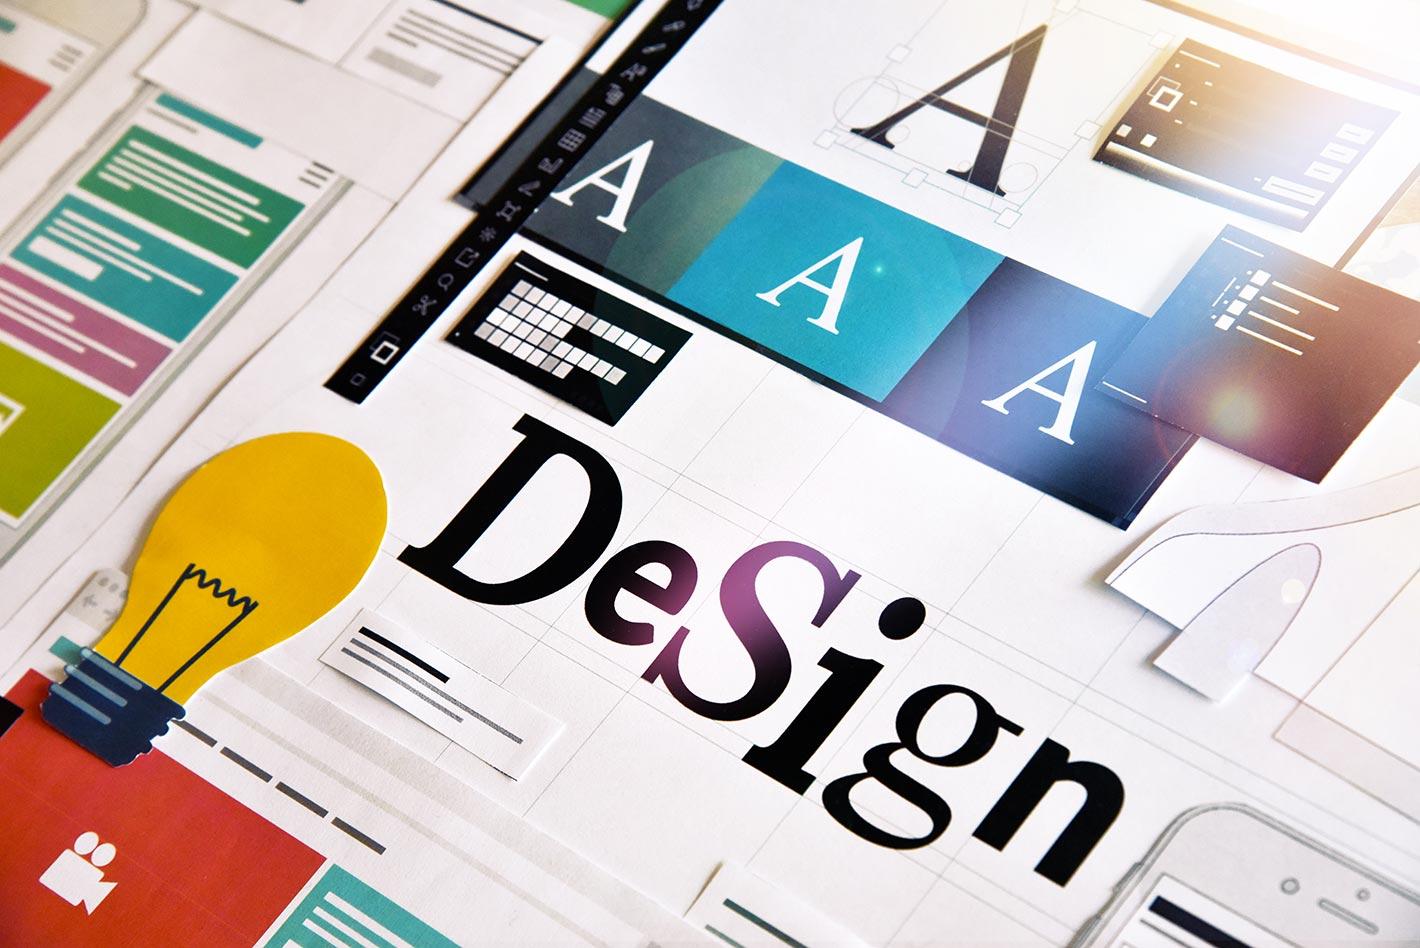 design-hubspot.jpg